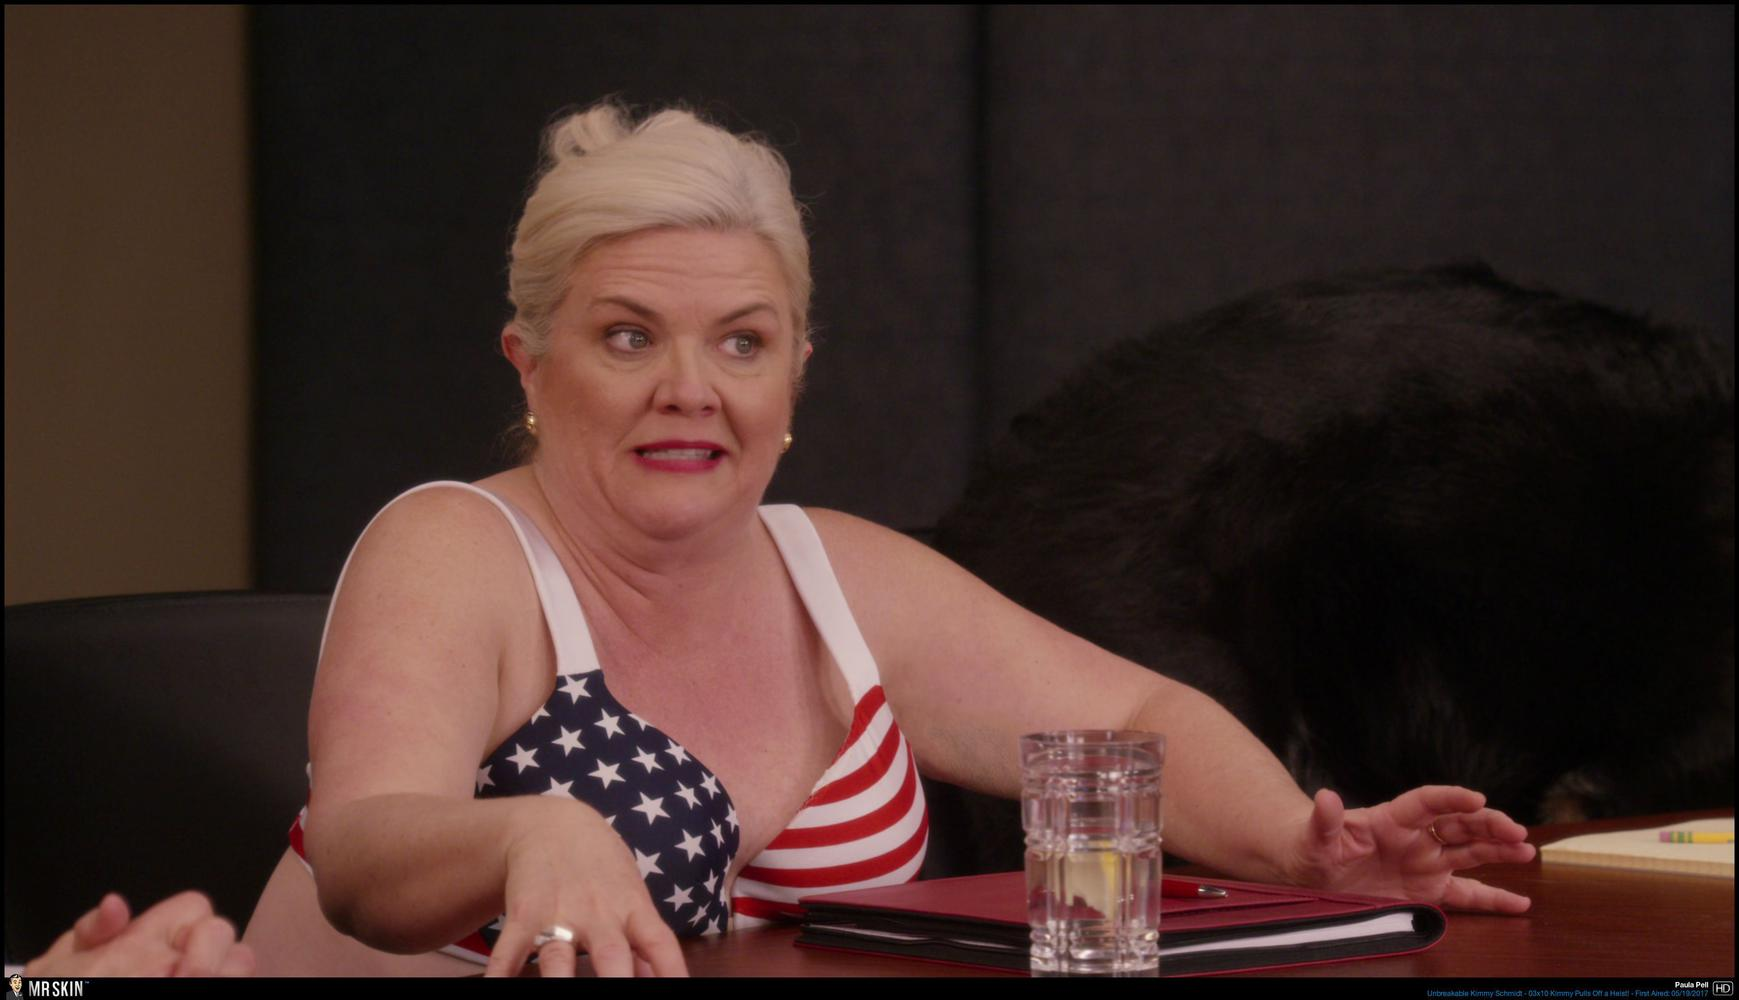 Amy Sedaris Naked unbreakable kimmy schmidt to break after season 4